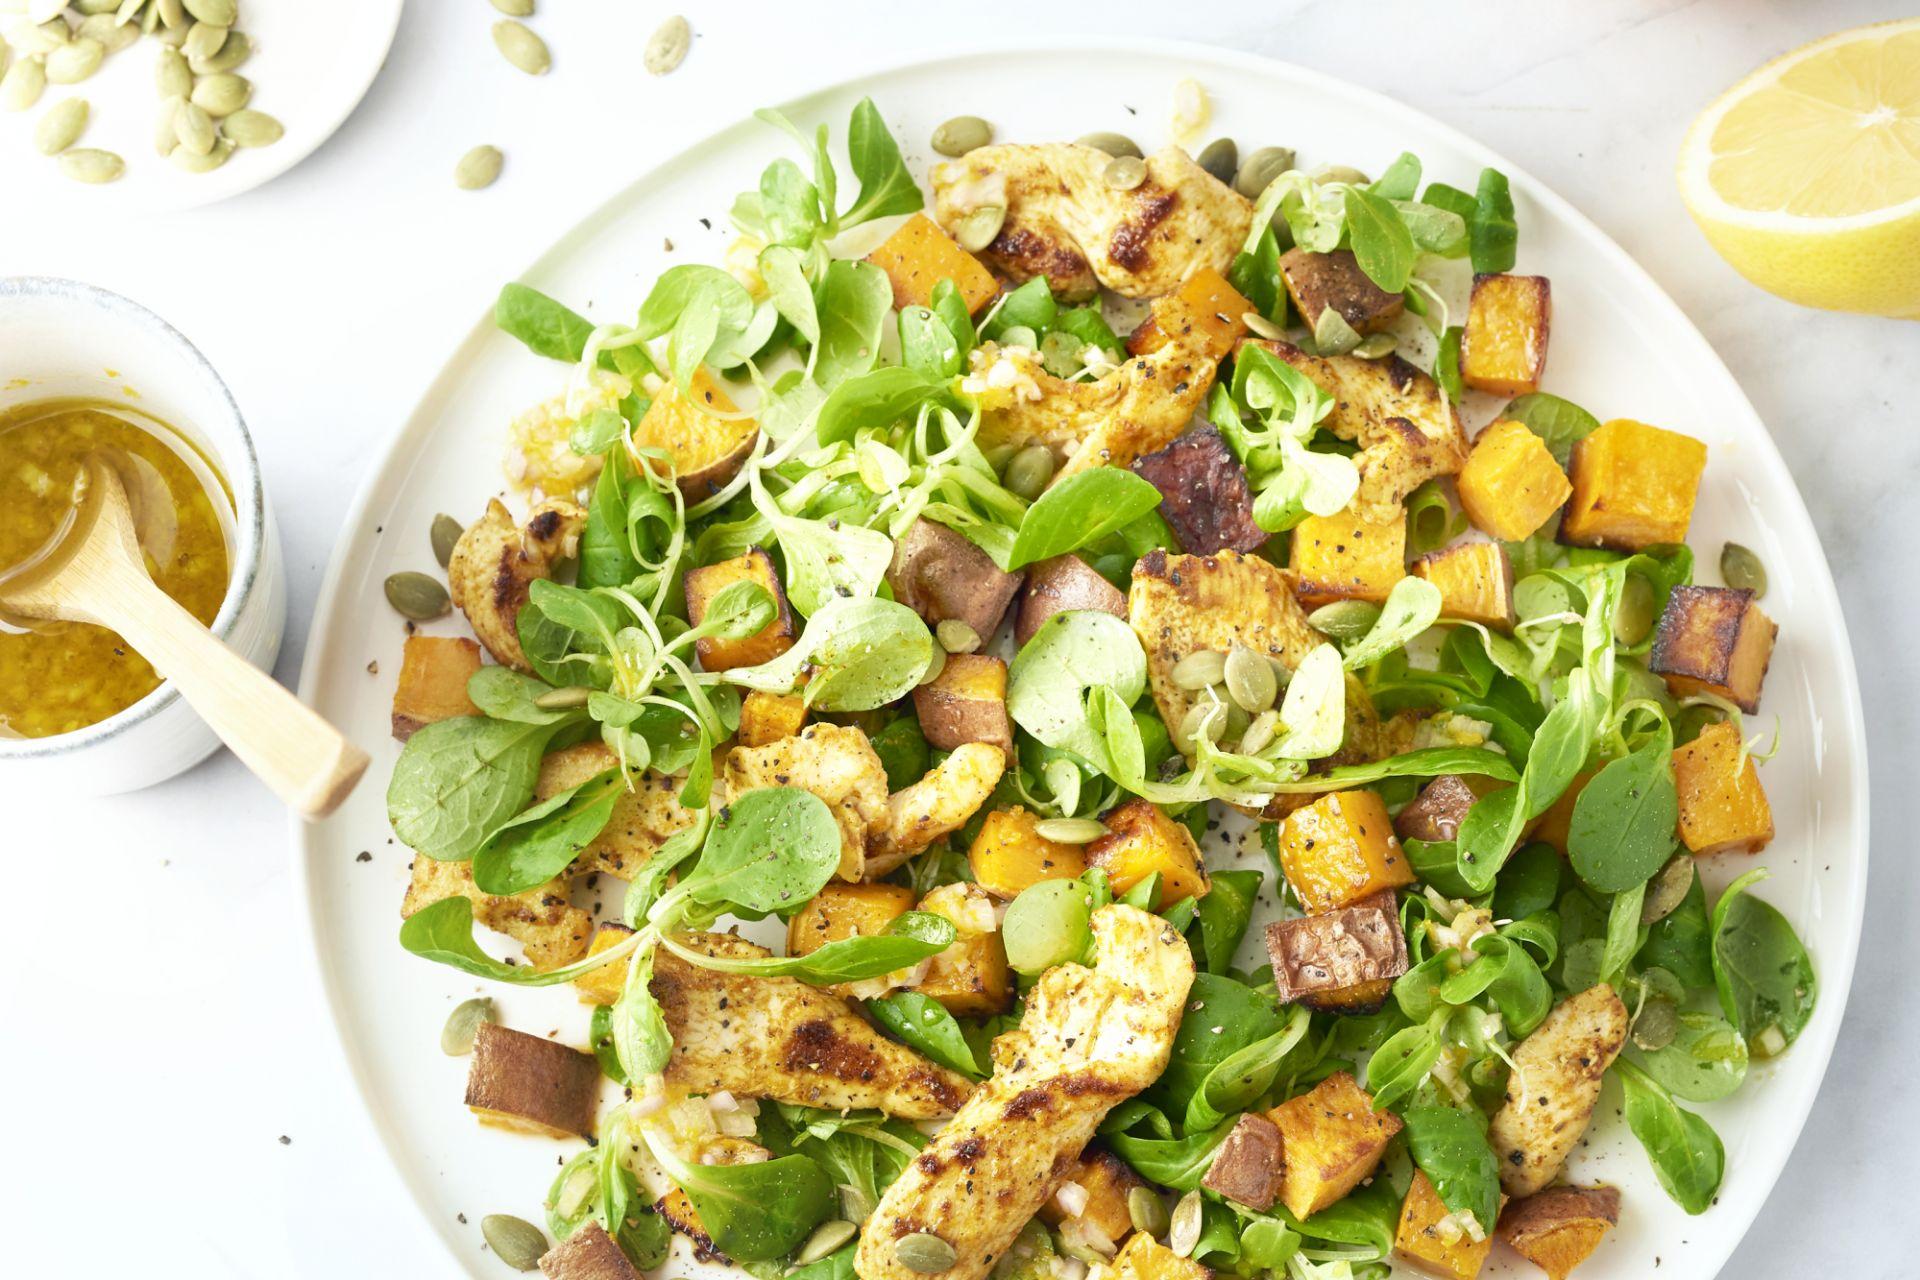 Salade van geroosterde zoete aardappel en kip met sinaasdressing